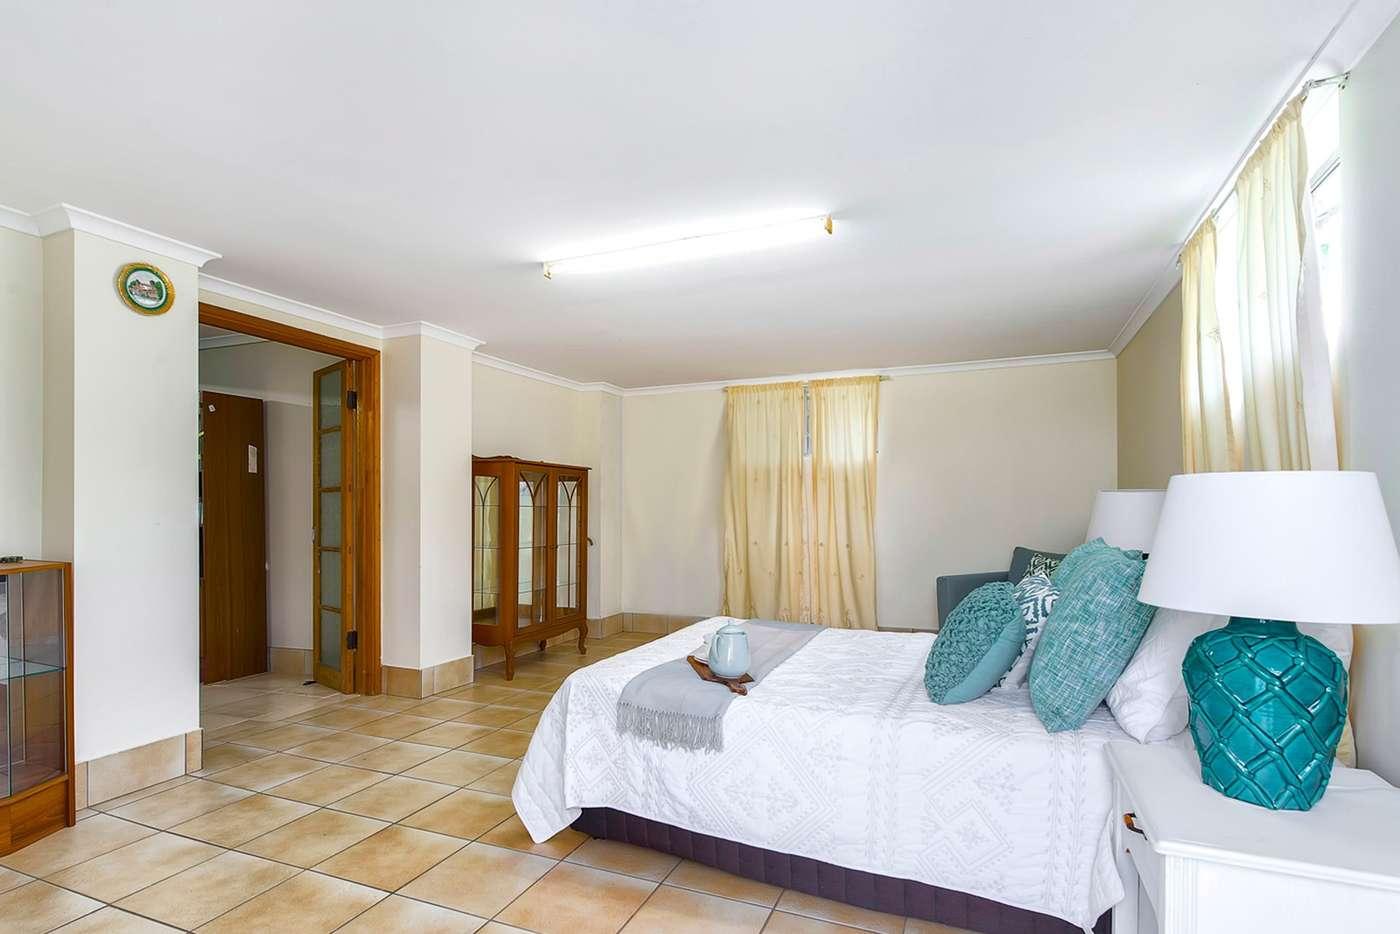 Sixth view of Homely house listing, 122 Lloyd Street, Alderley QLD 4051